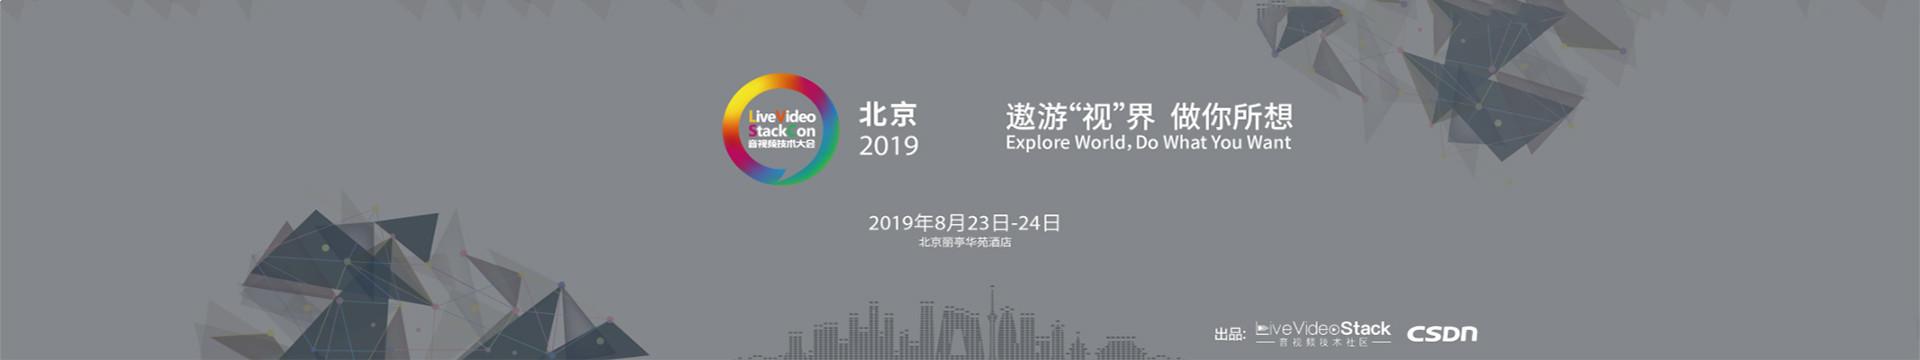 LiveVideoStackCon 2019音视频技术大会(北京)